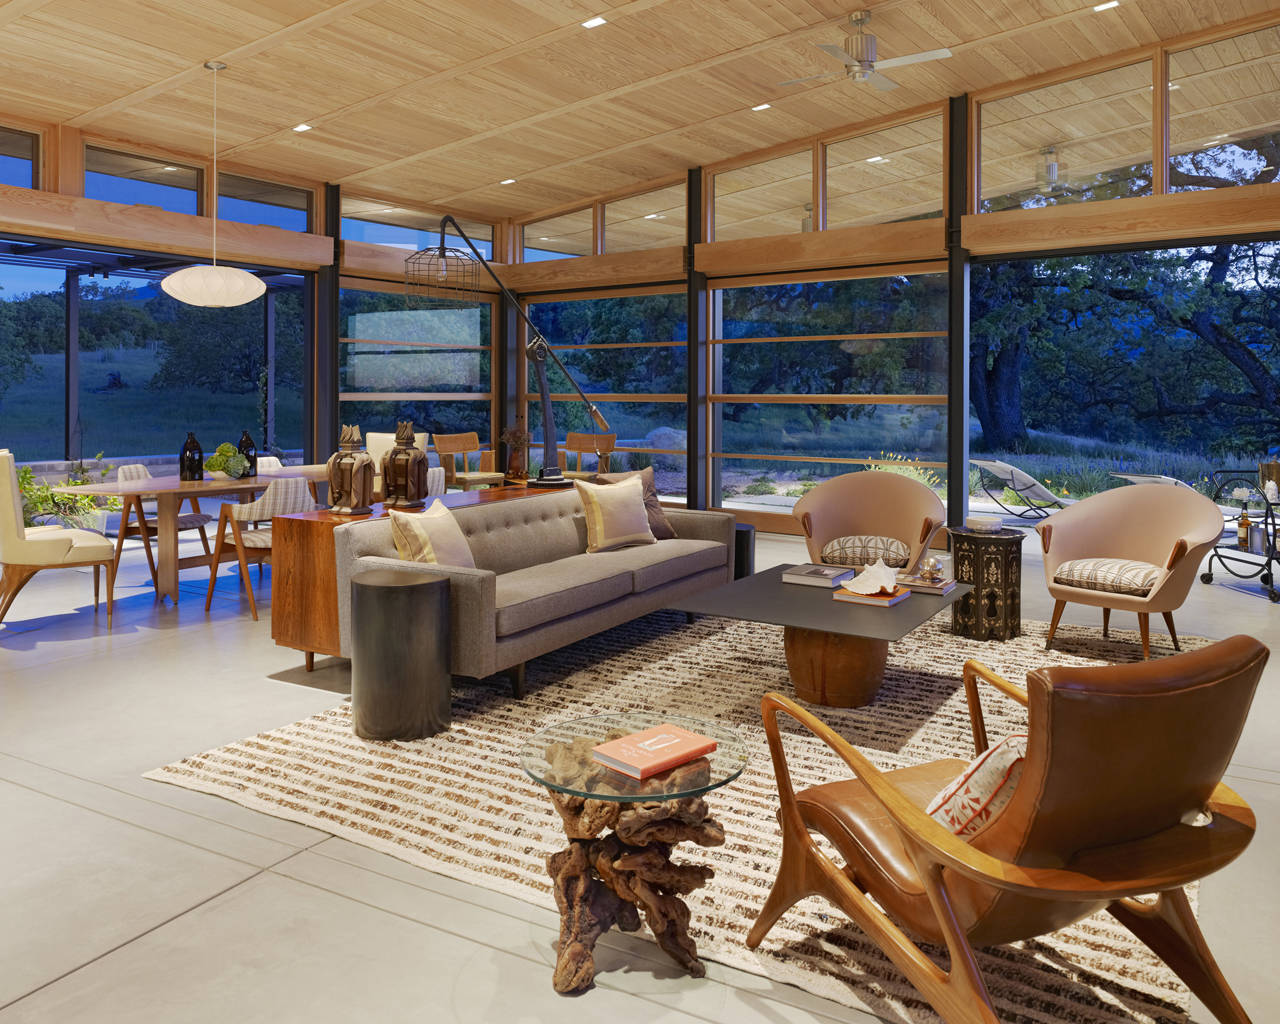 Living, Dining Space, Caterpillar House in Carmel, California by Feldman Architecture